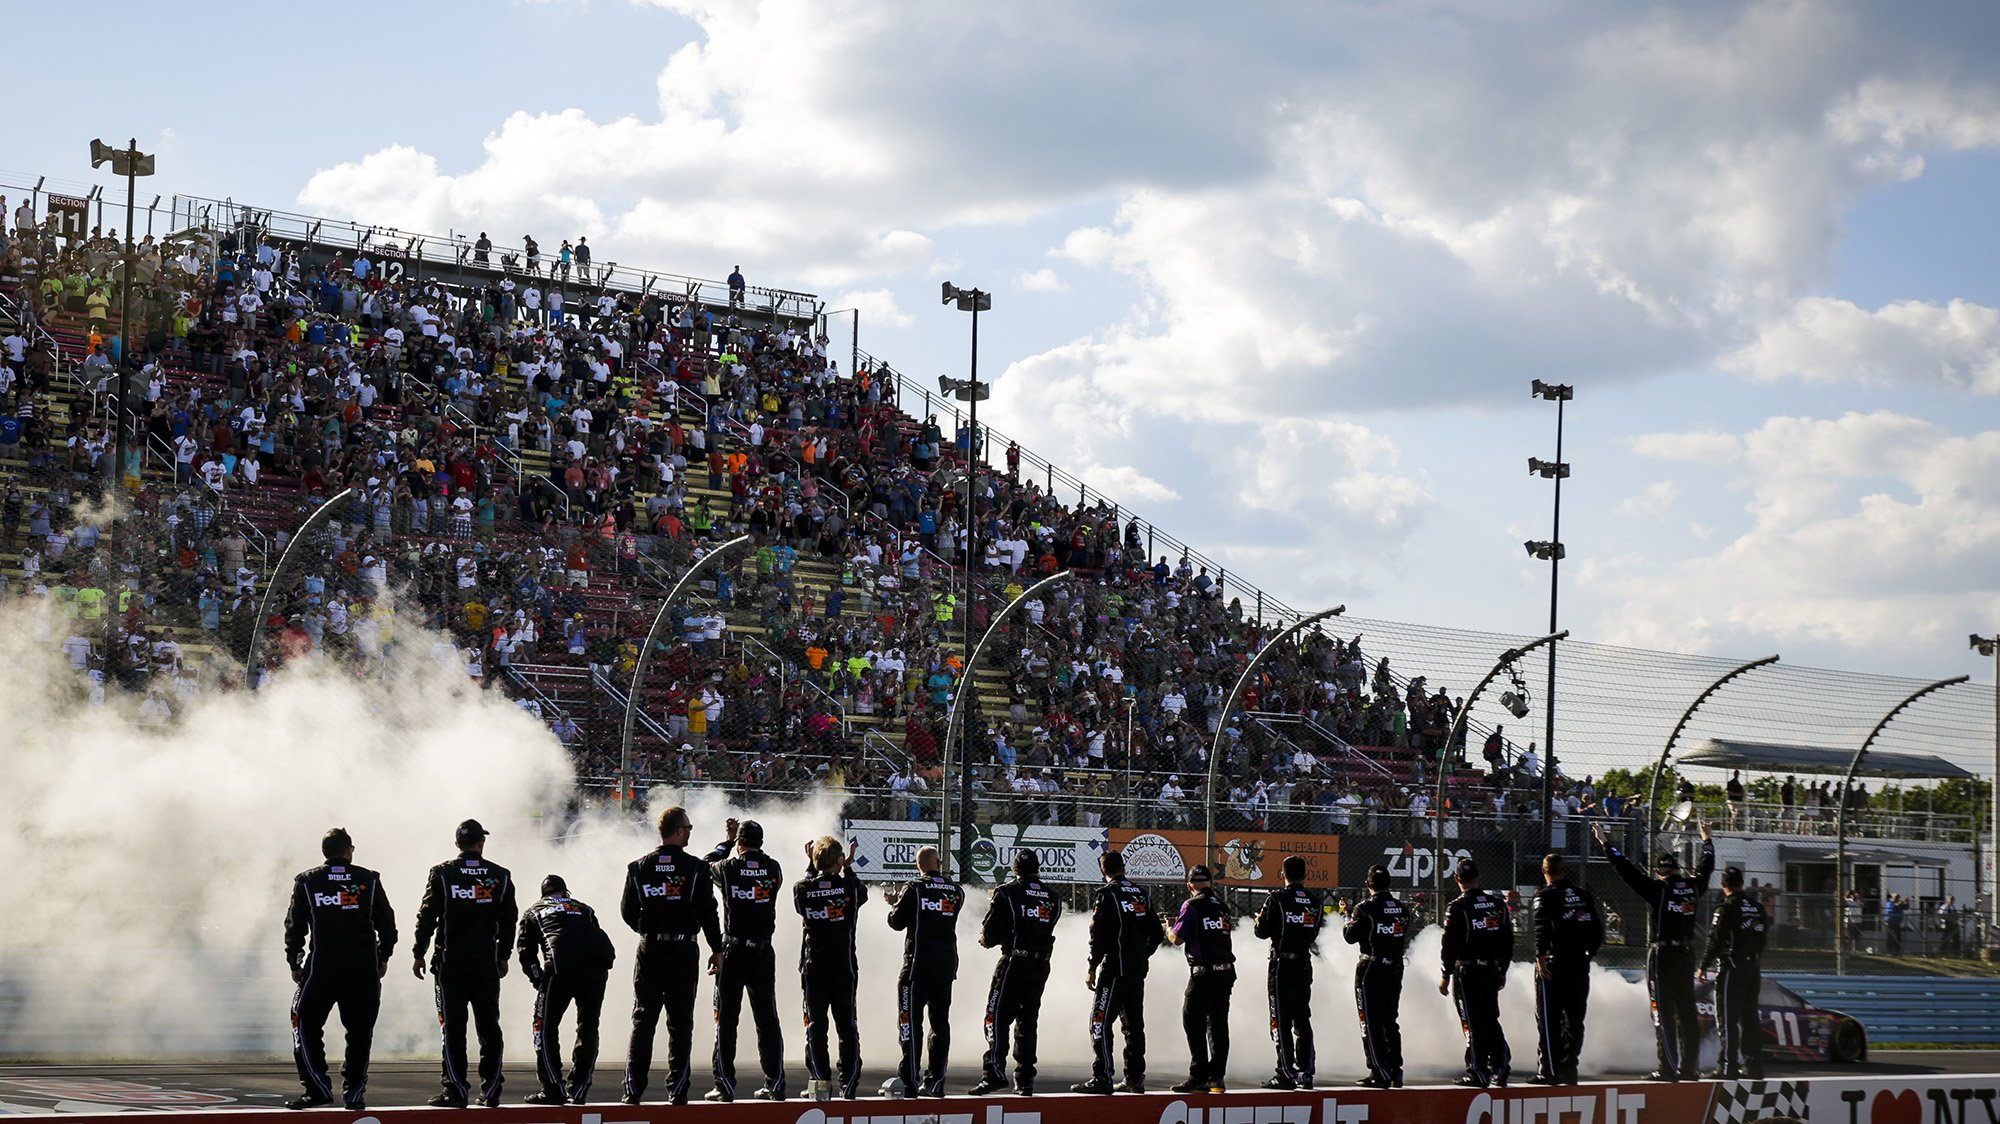 2016 Sprint Cup Watkins Glen